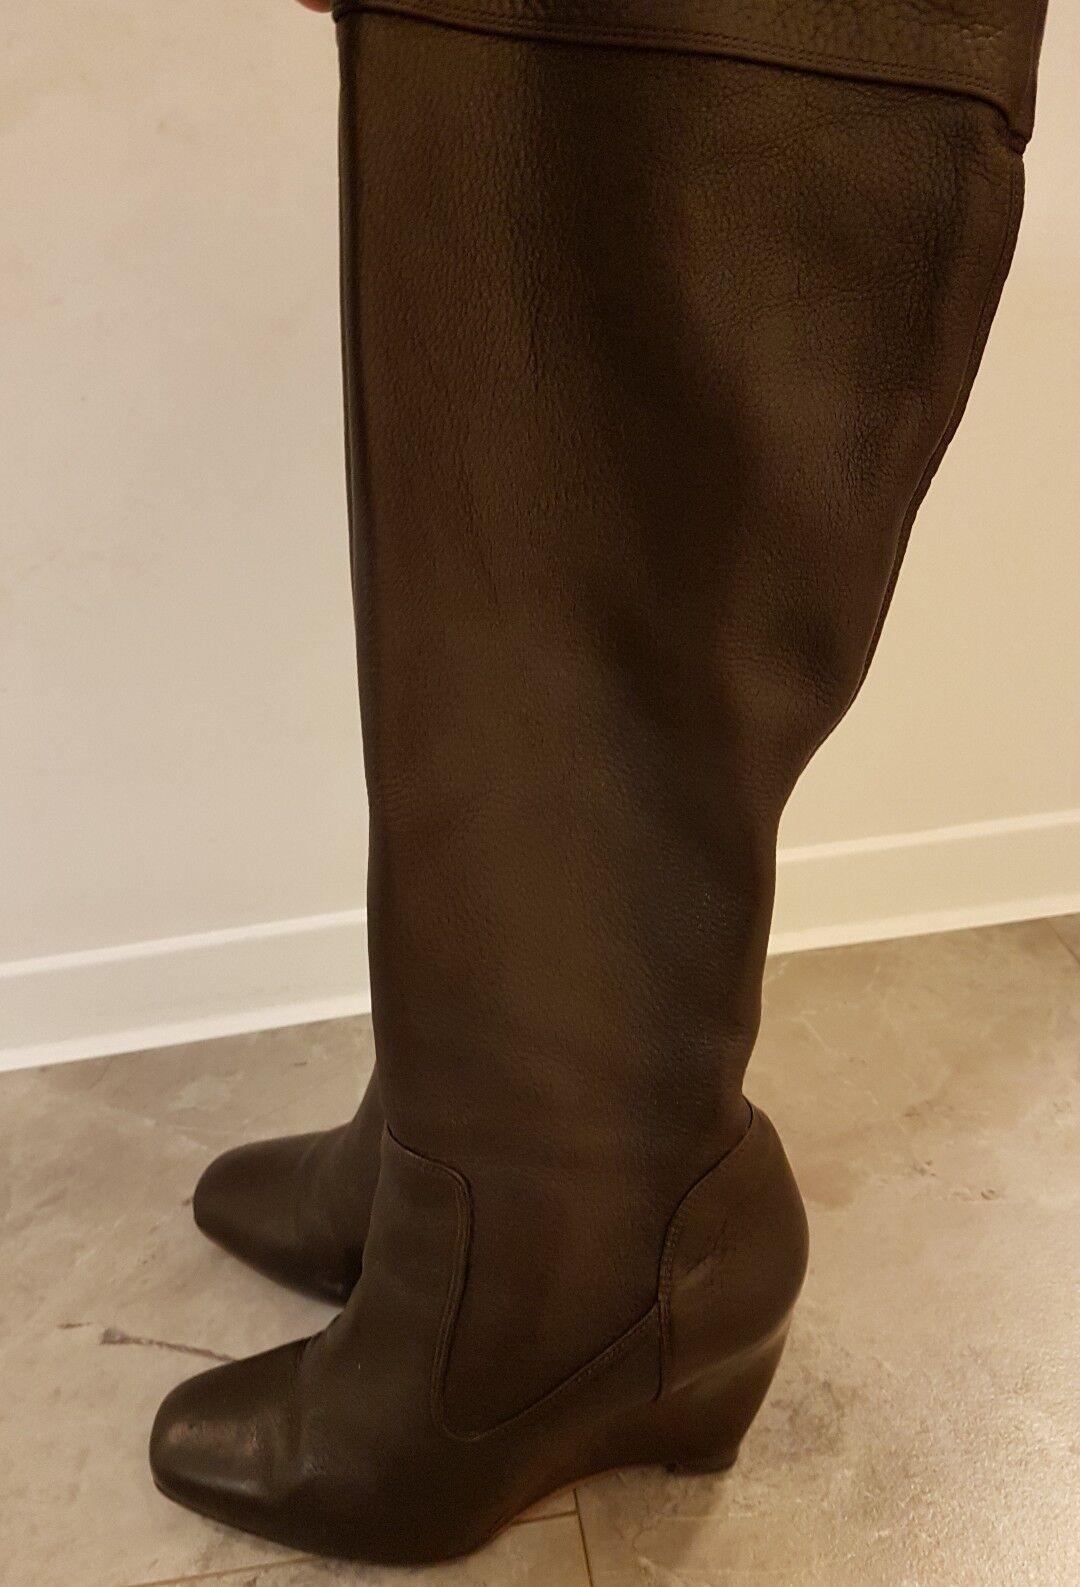 Hugo Boss  Stiefel  Gr 39